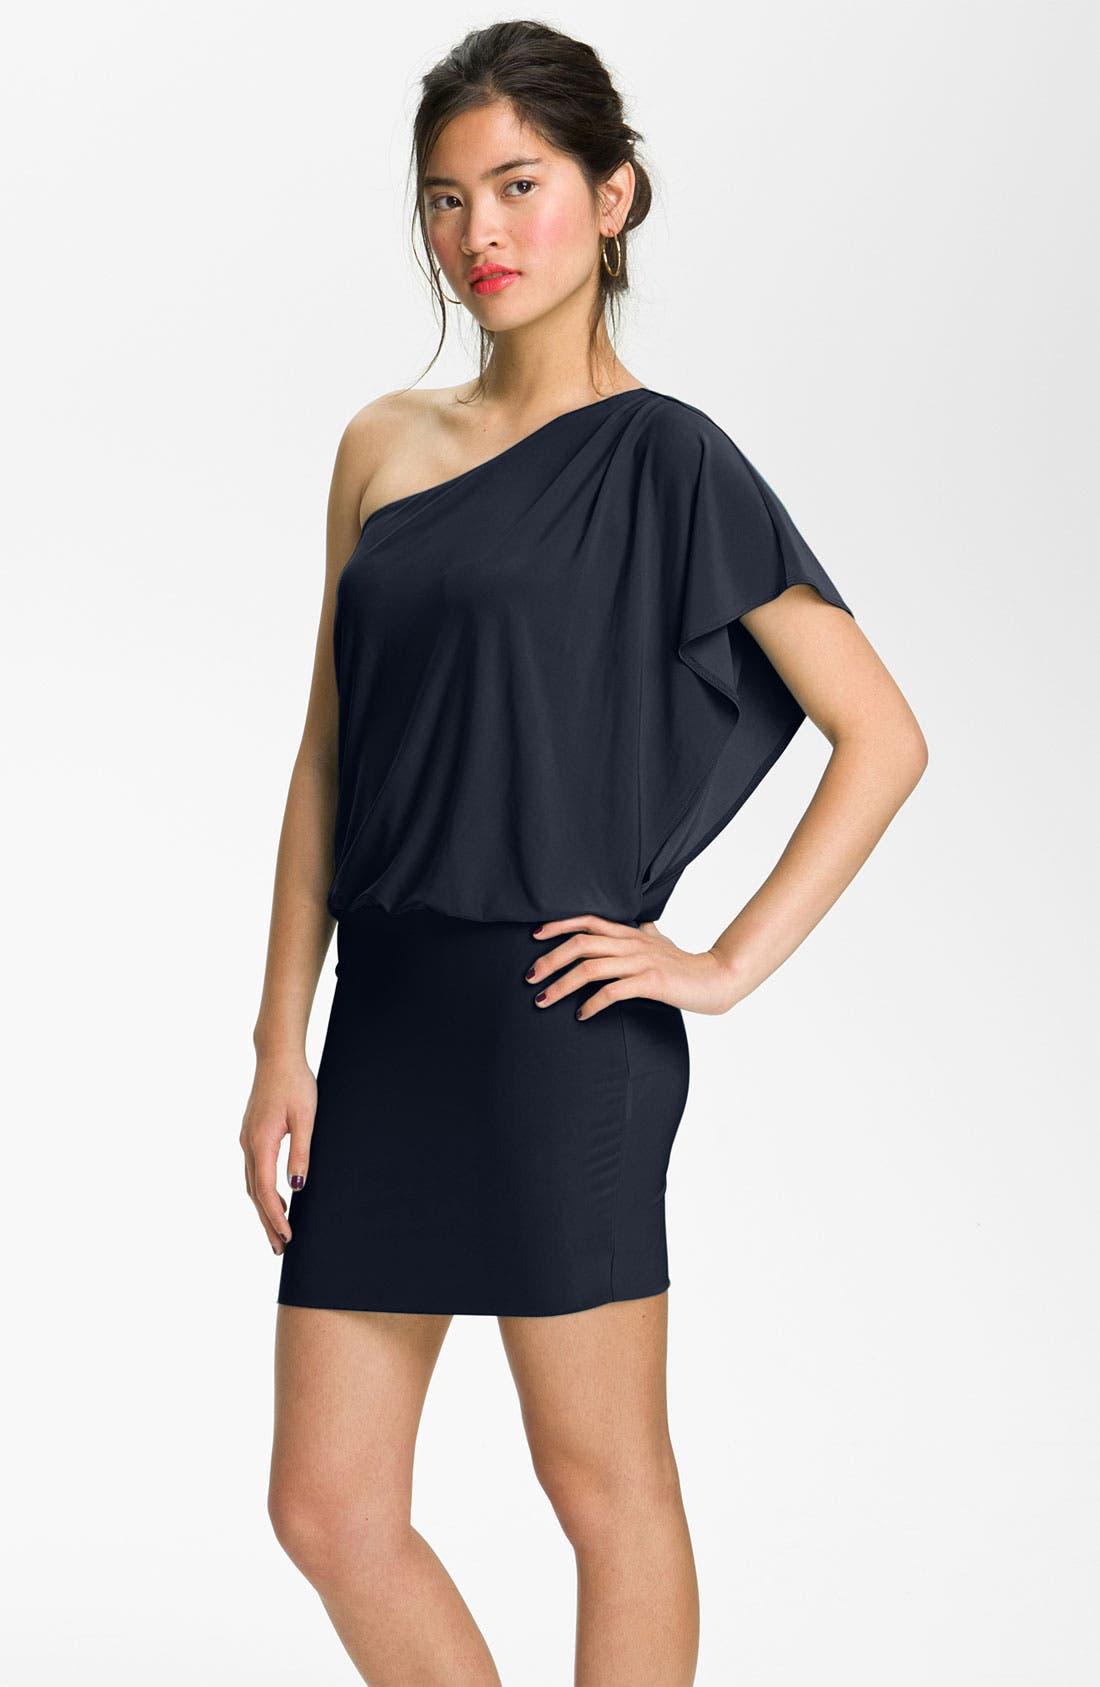 Alternate Image 1 Selected - Soprano 'Mia' One Shoulder Dress (Juniors)